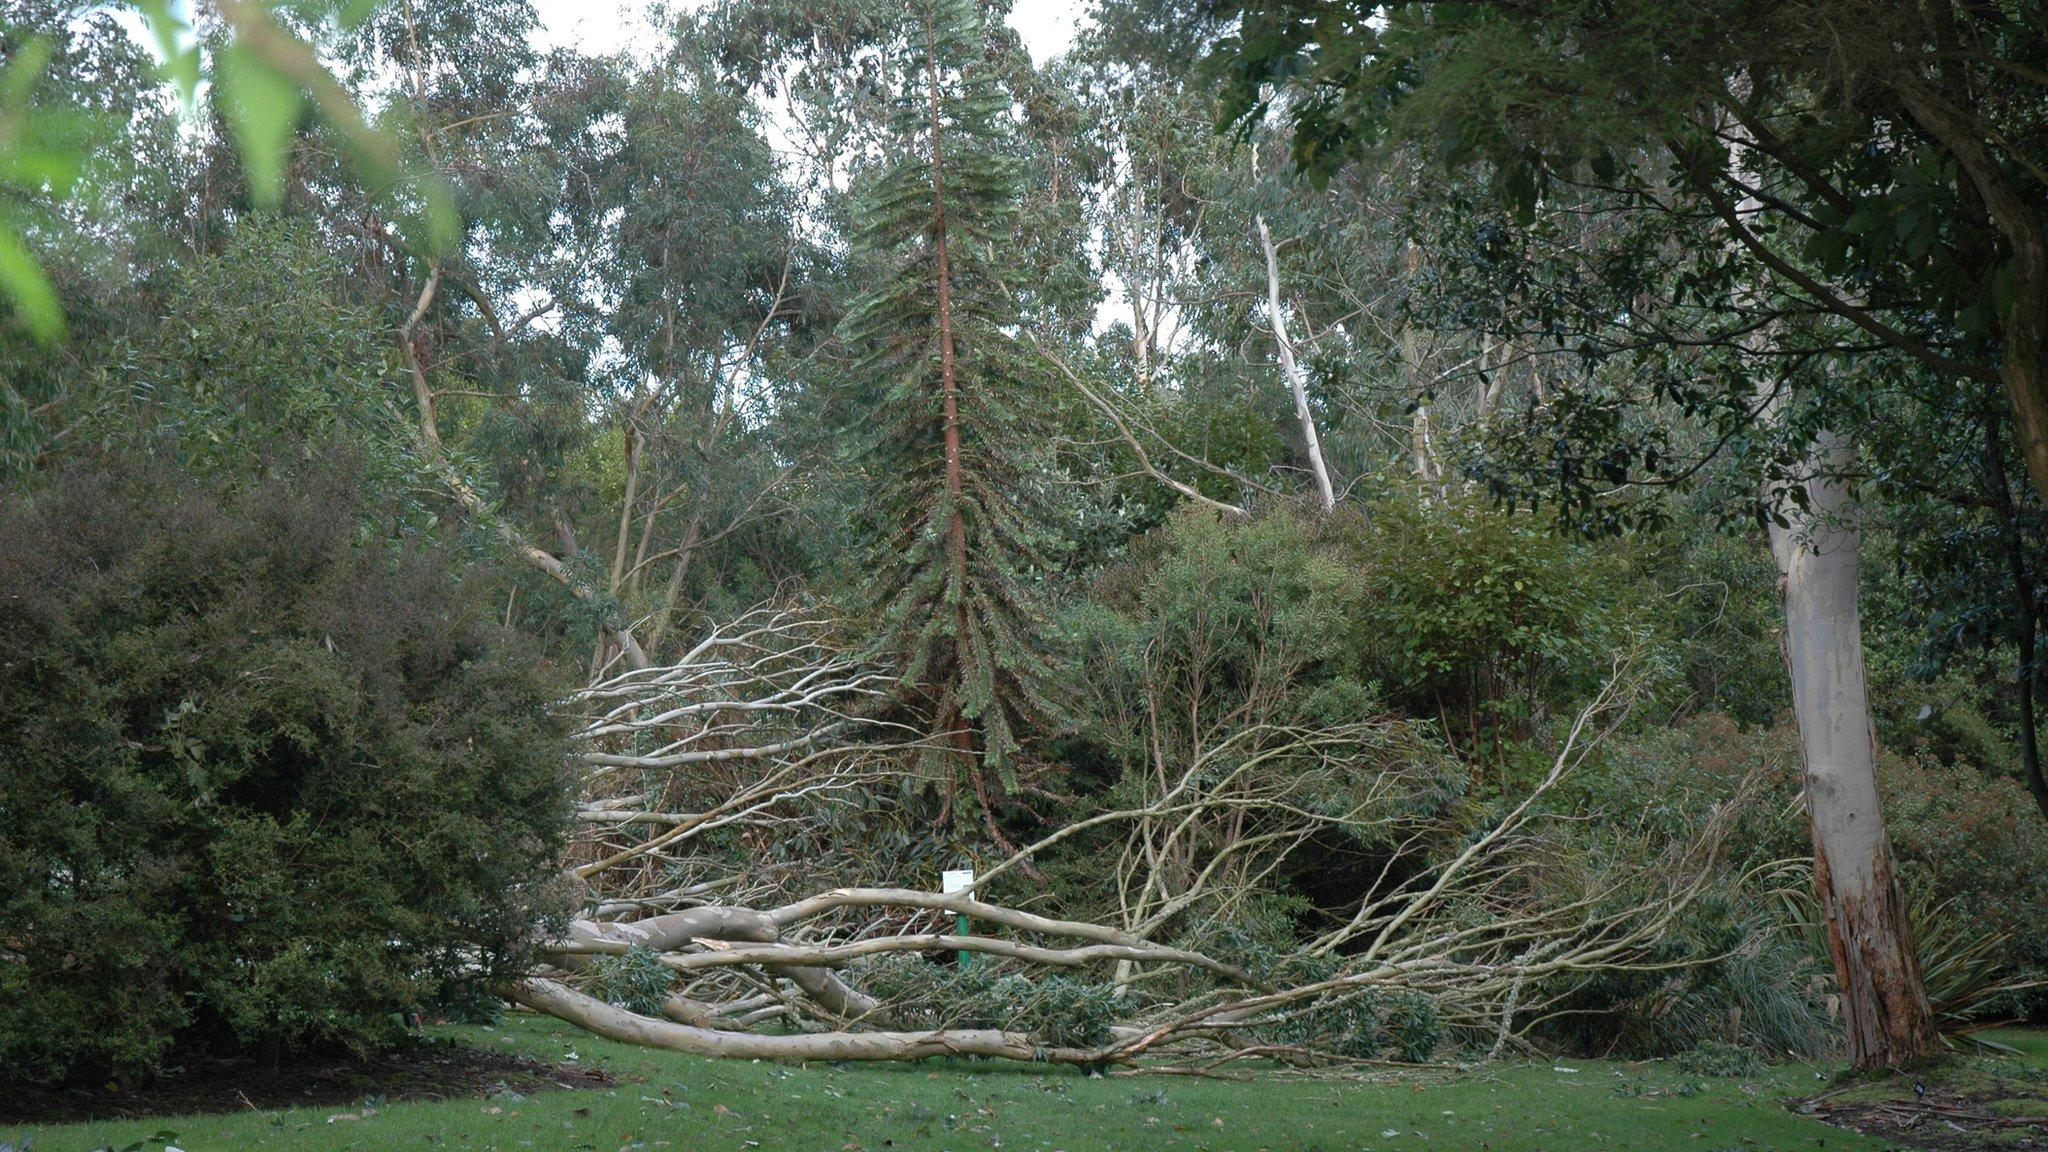 Logan Botanic Garden suffers 'sad day' with Storm Ali